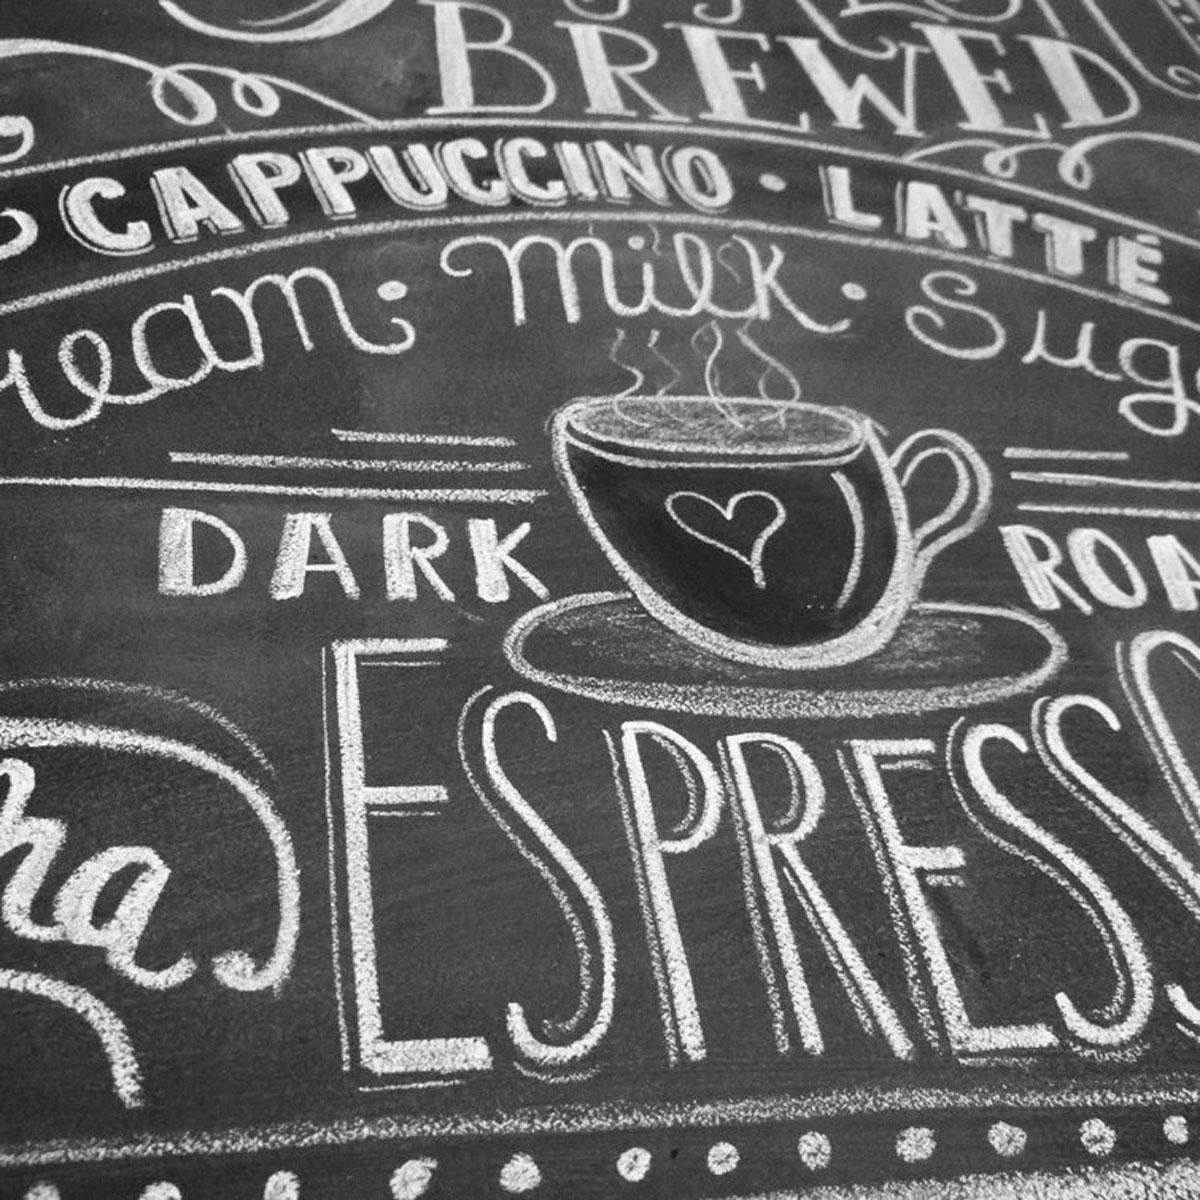 mrwonderfulshop_P8COF1_lamina_coffee_03